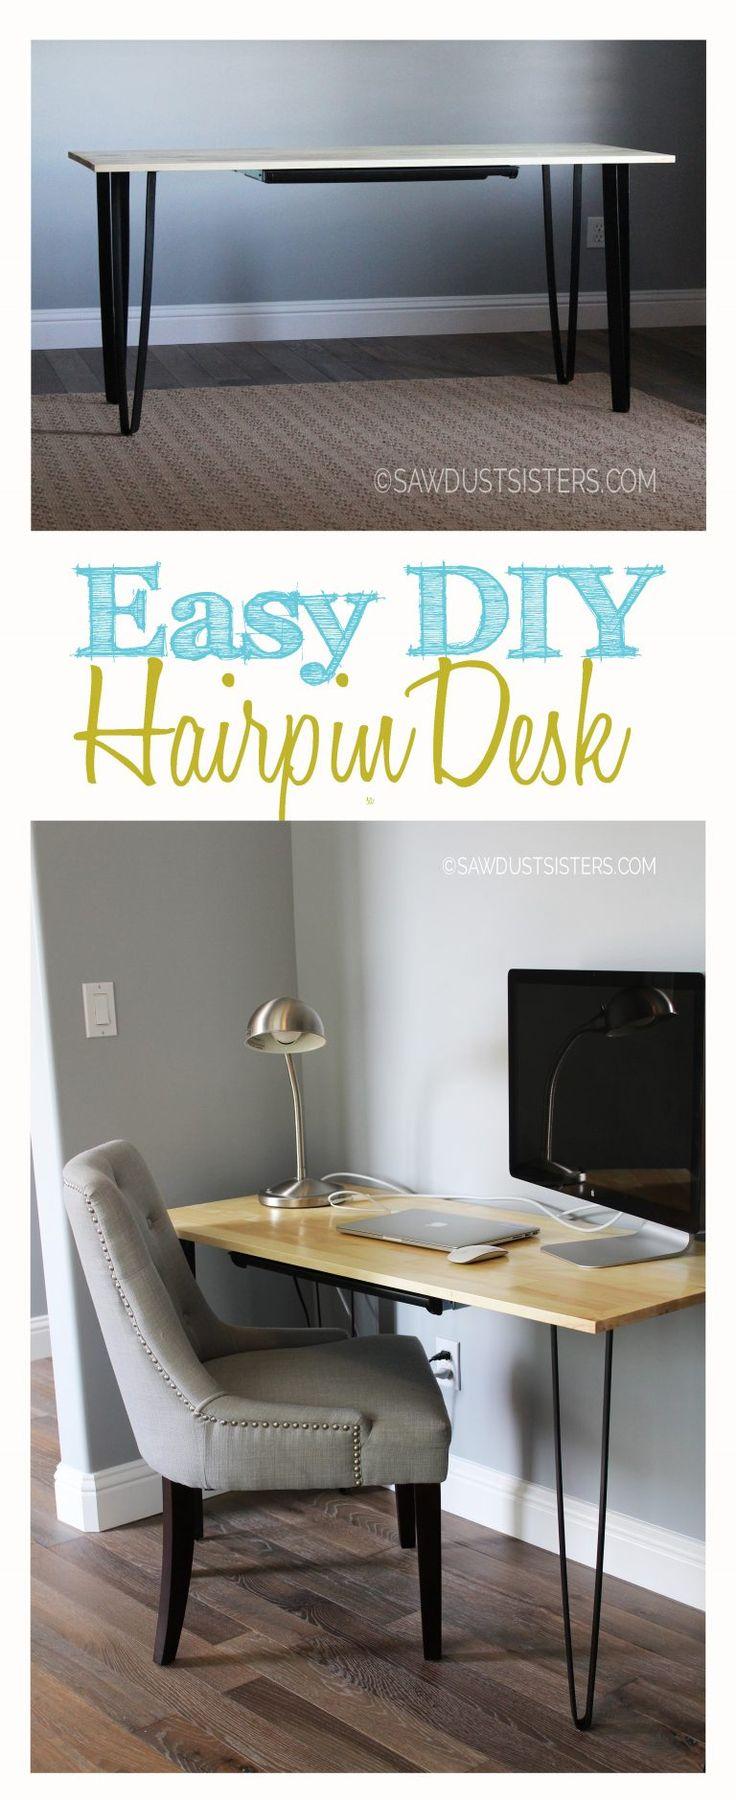 Easy DIY Writing Desk with Pencil Drawer Diy furniture